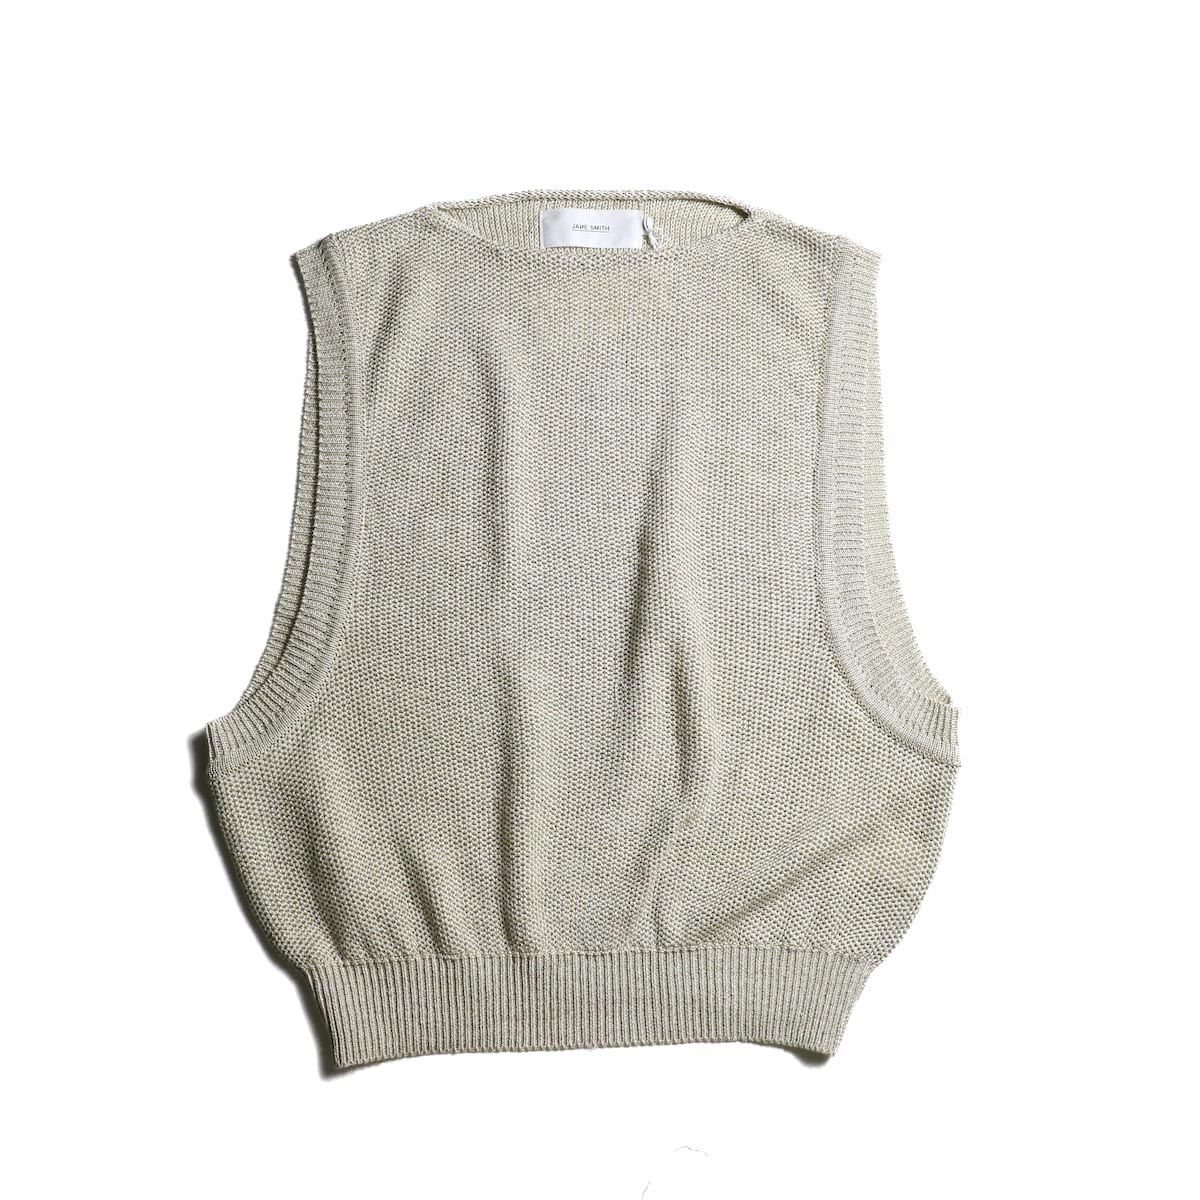 JANE SMITH / Over Vest (Beige)